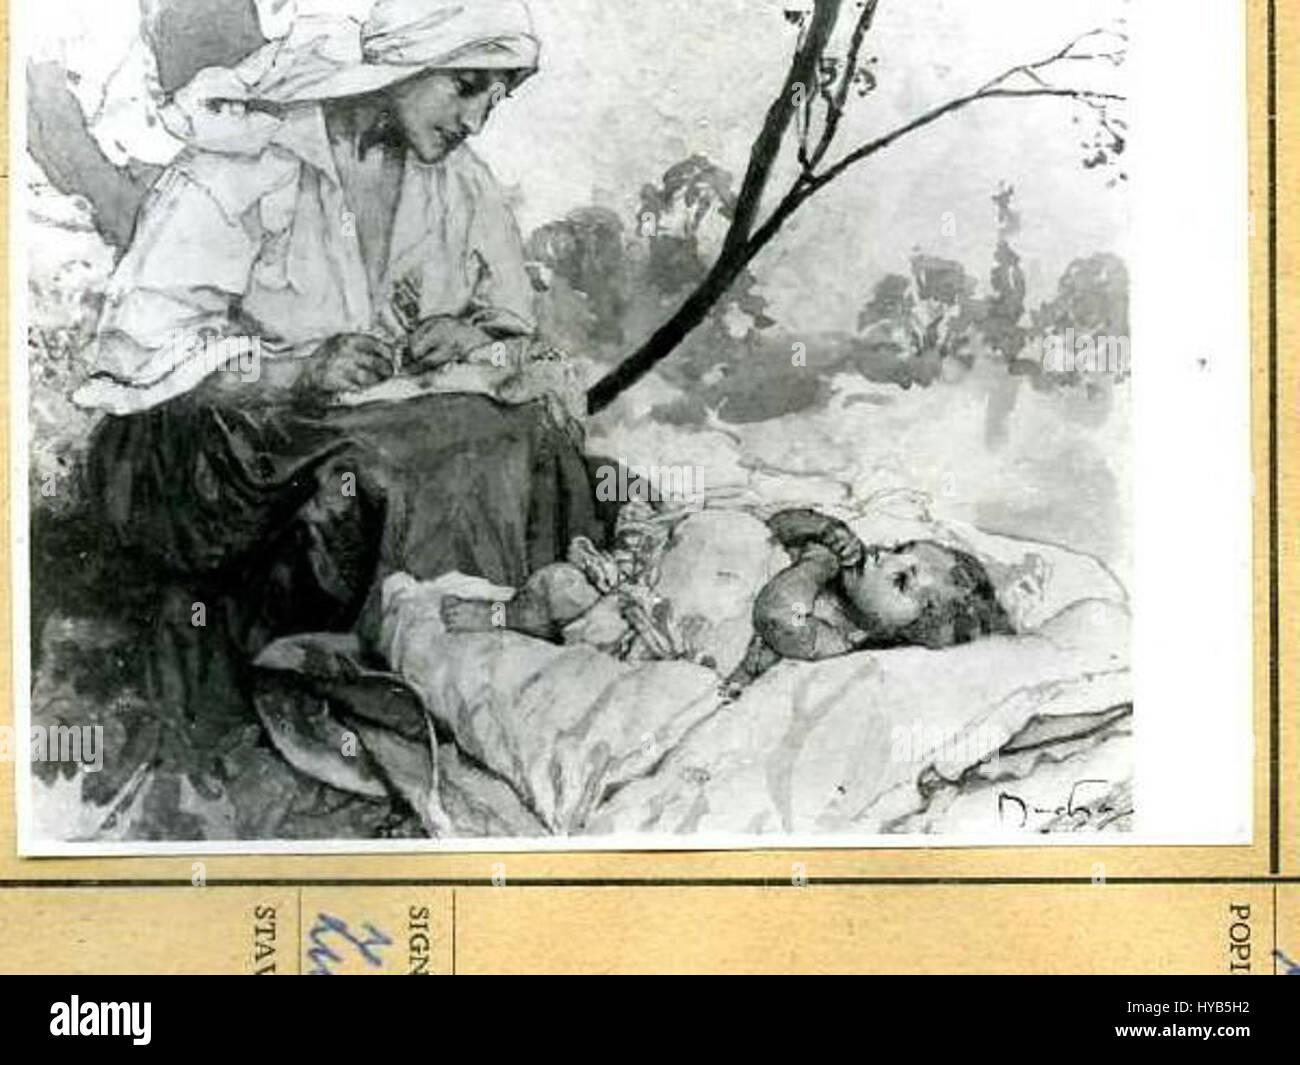 Autor Alfons Mucha 24.7.1860 14.7.1939   Matka sedici nad ditetem   ilustrace ke knize Slavia starostlivym matkam Stock Photo